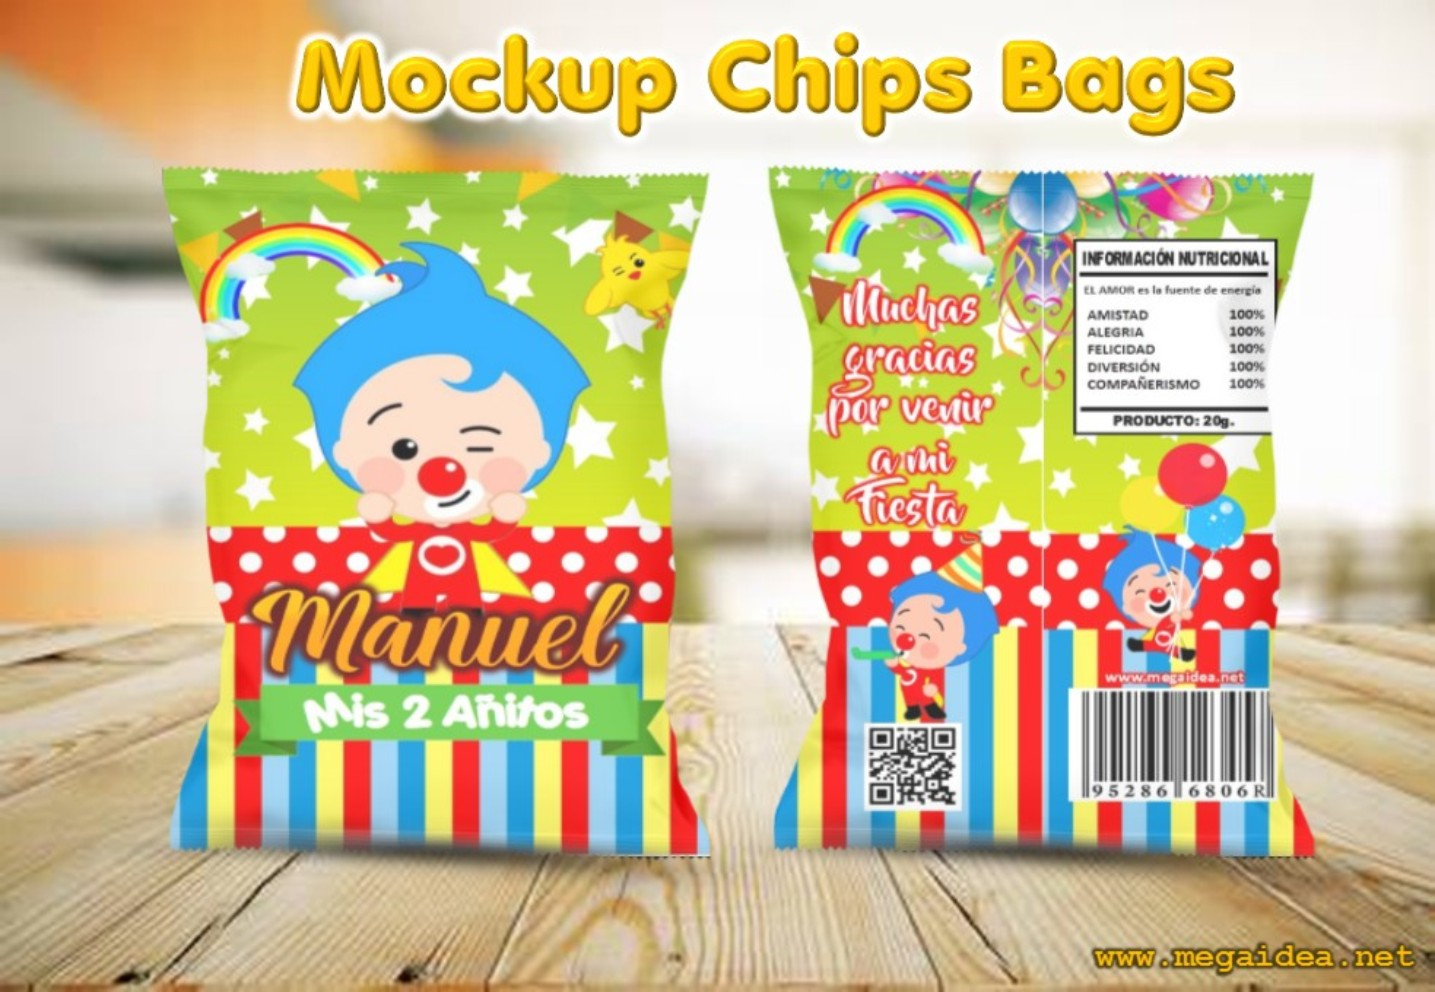 Mockup Chips Bags2